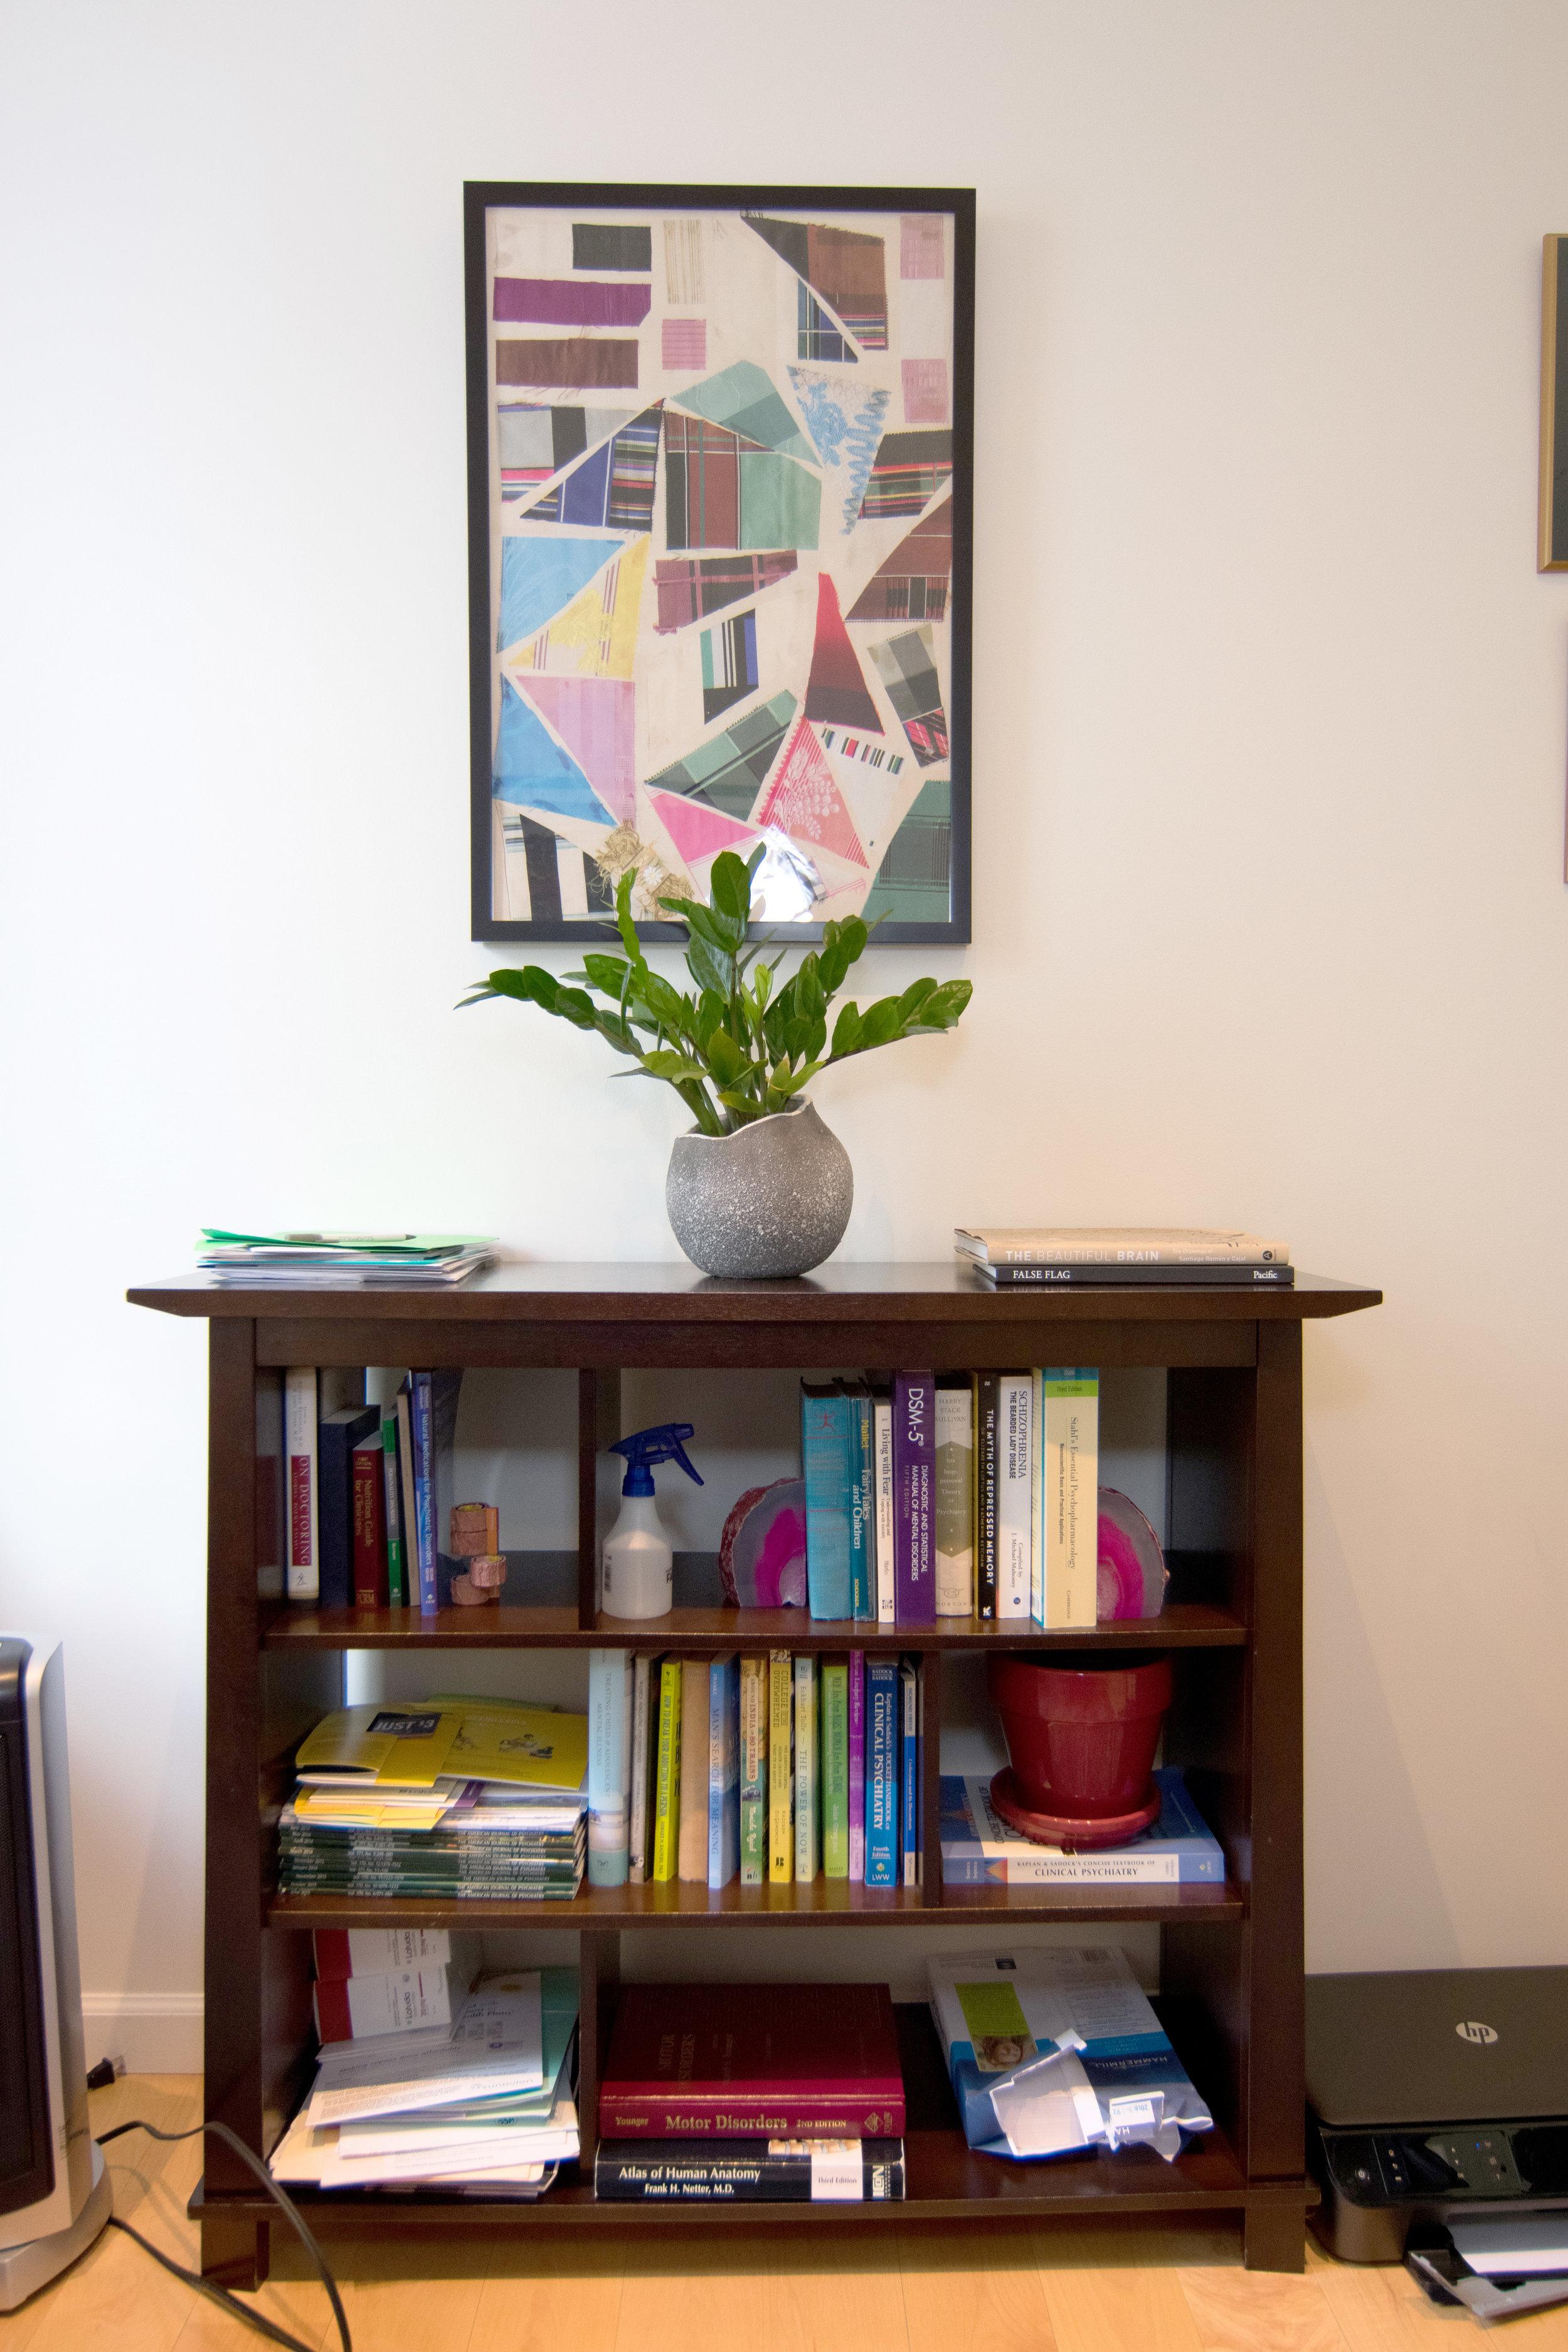 serene-offices-therapy-office-flatiron-21st-street-room-2-bookshelf-detail.jpg